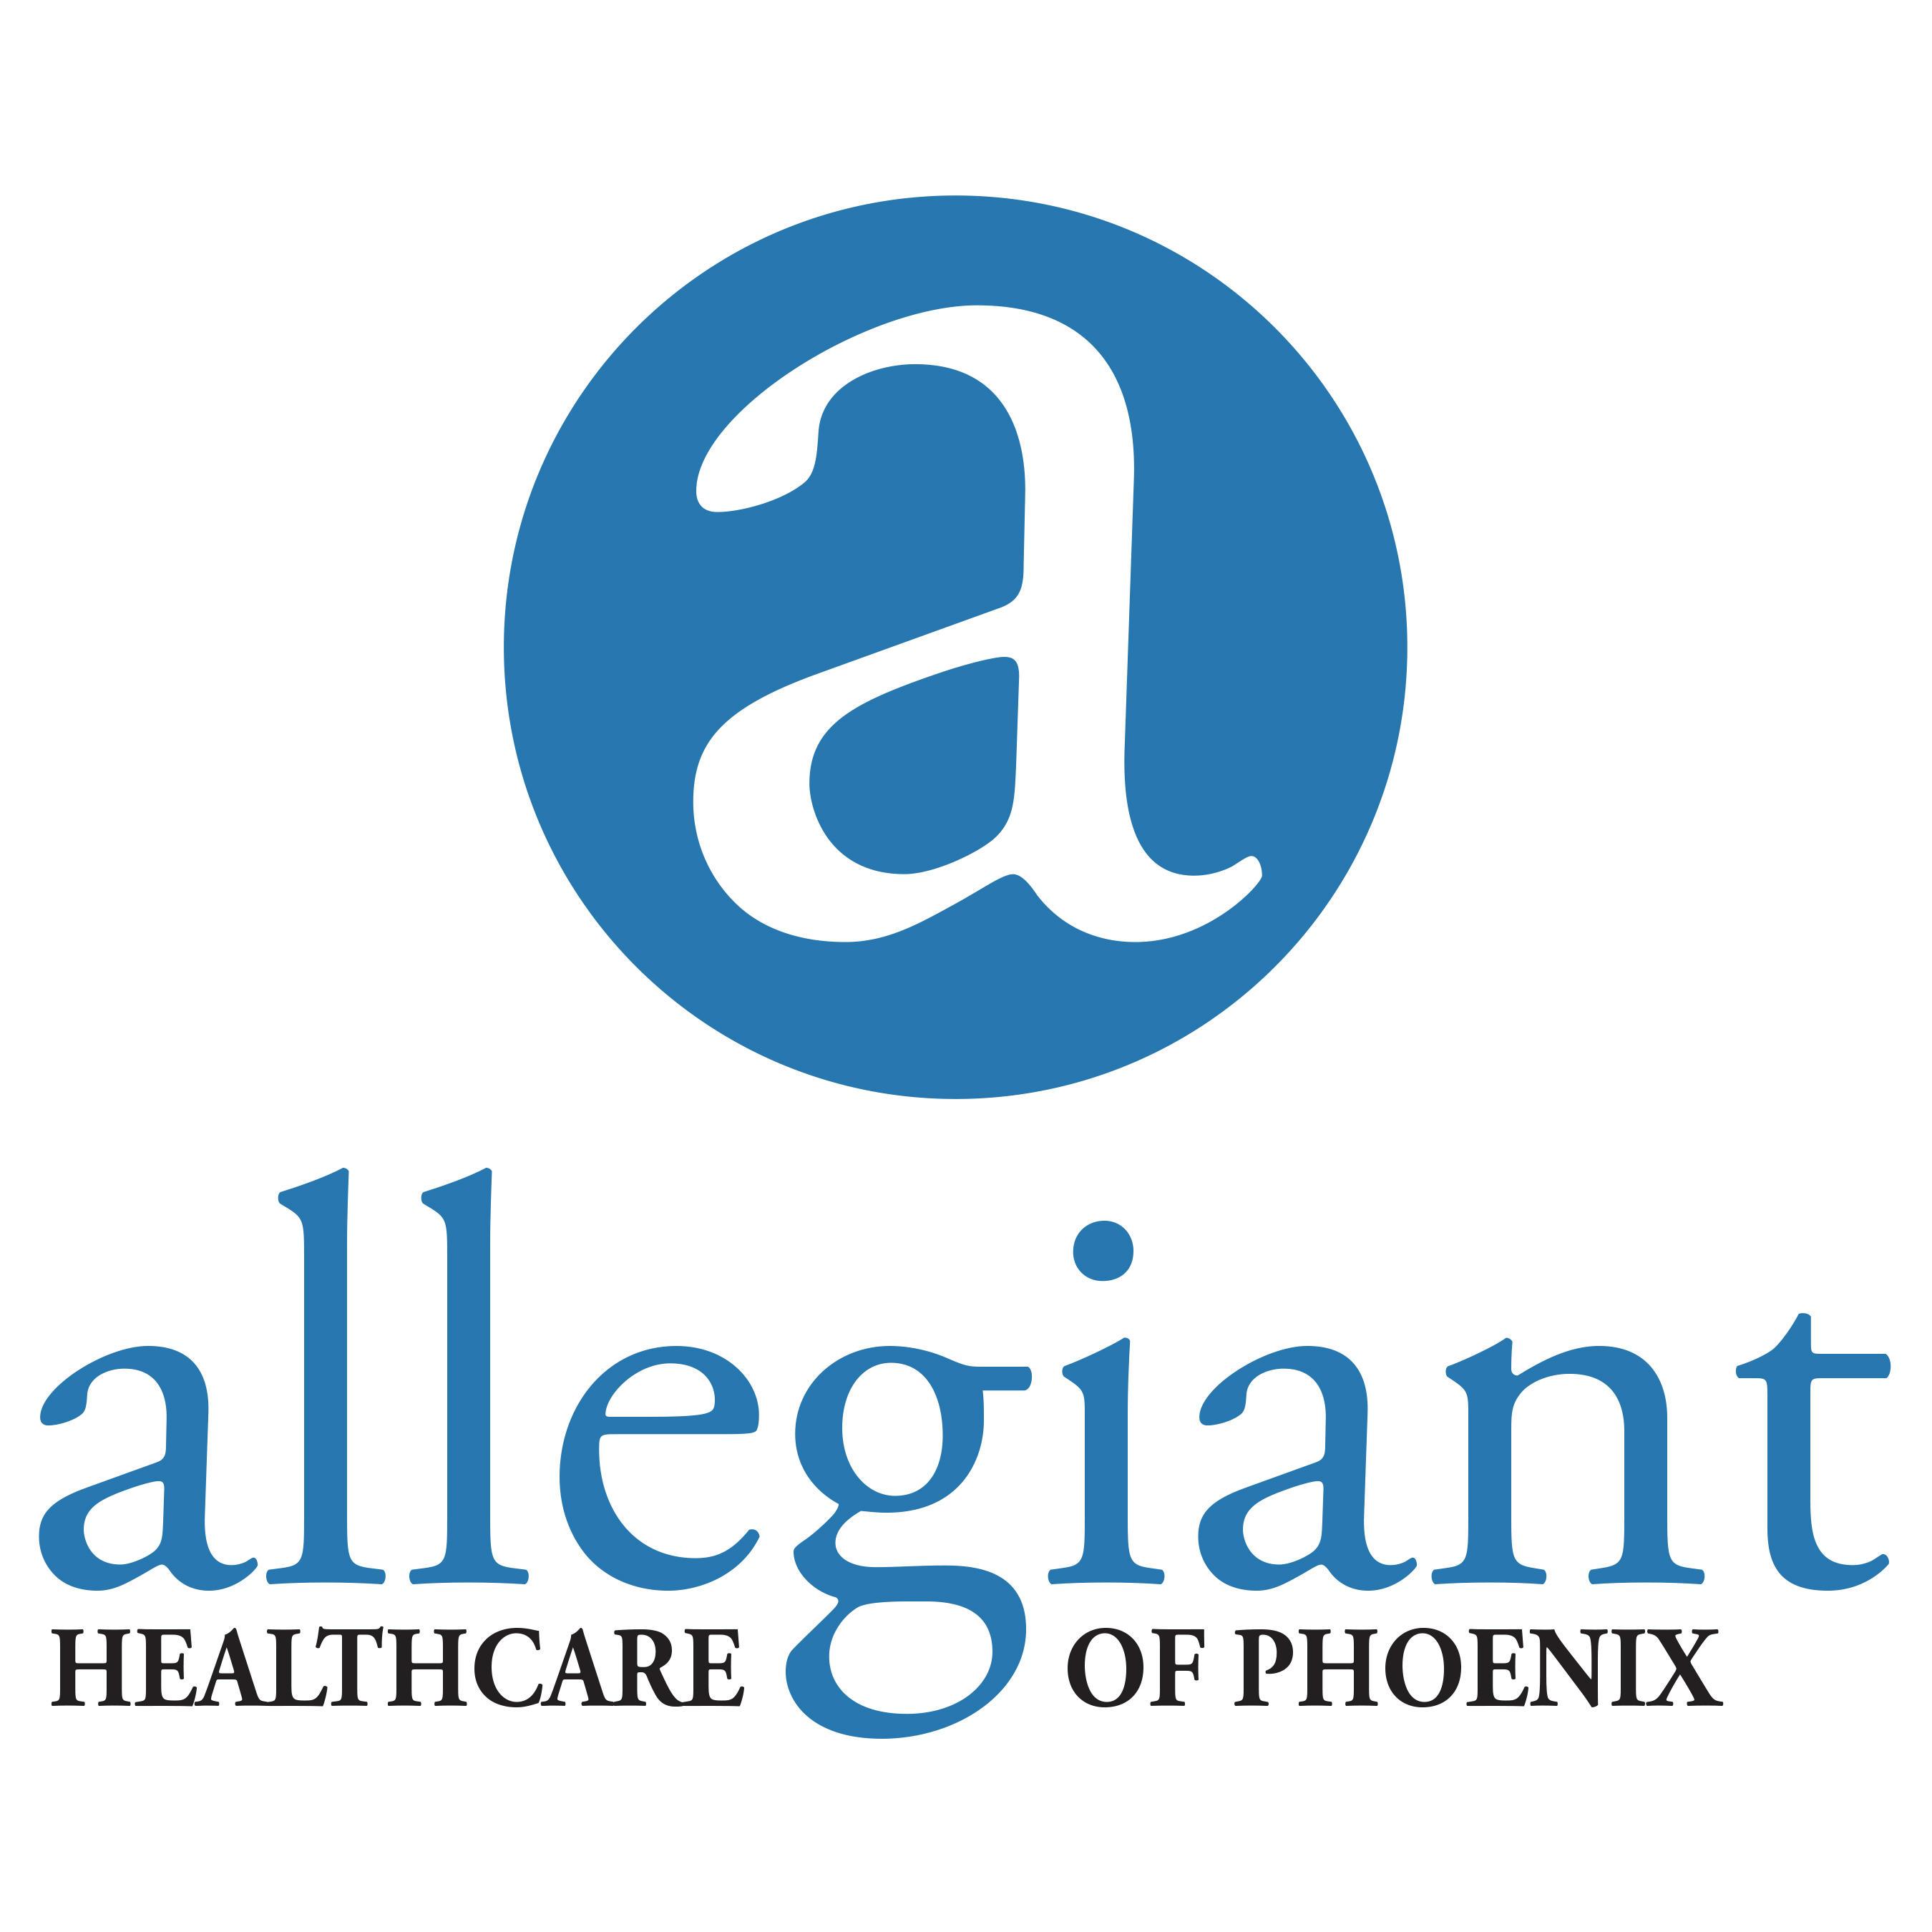 Allegiant Healthcare of Phoenix image 5